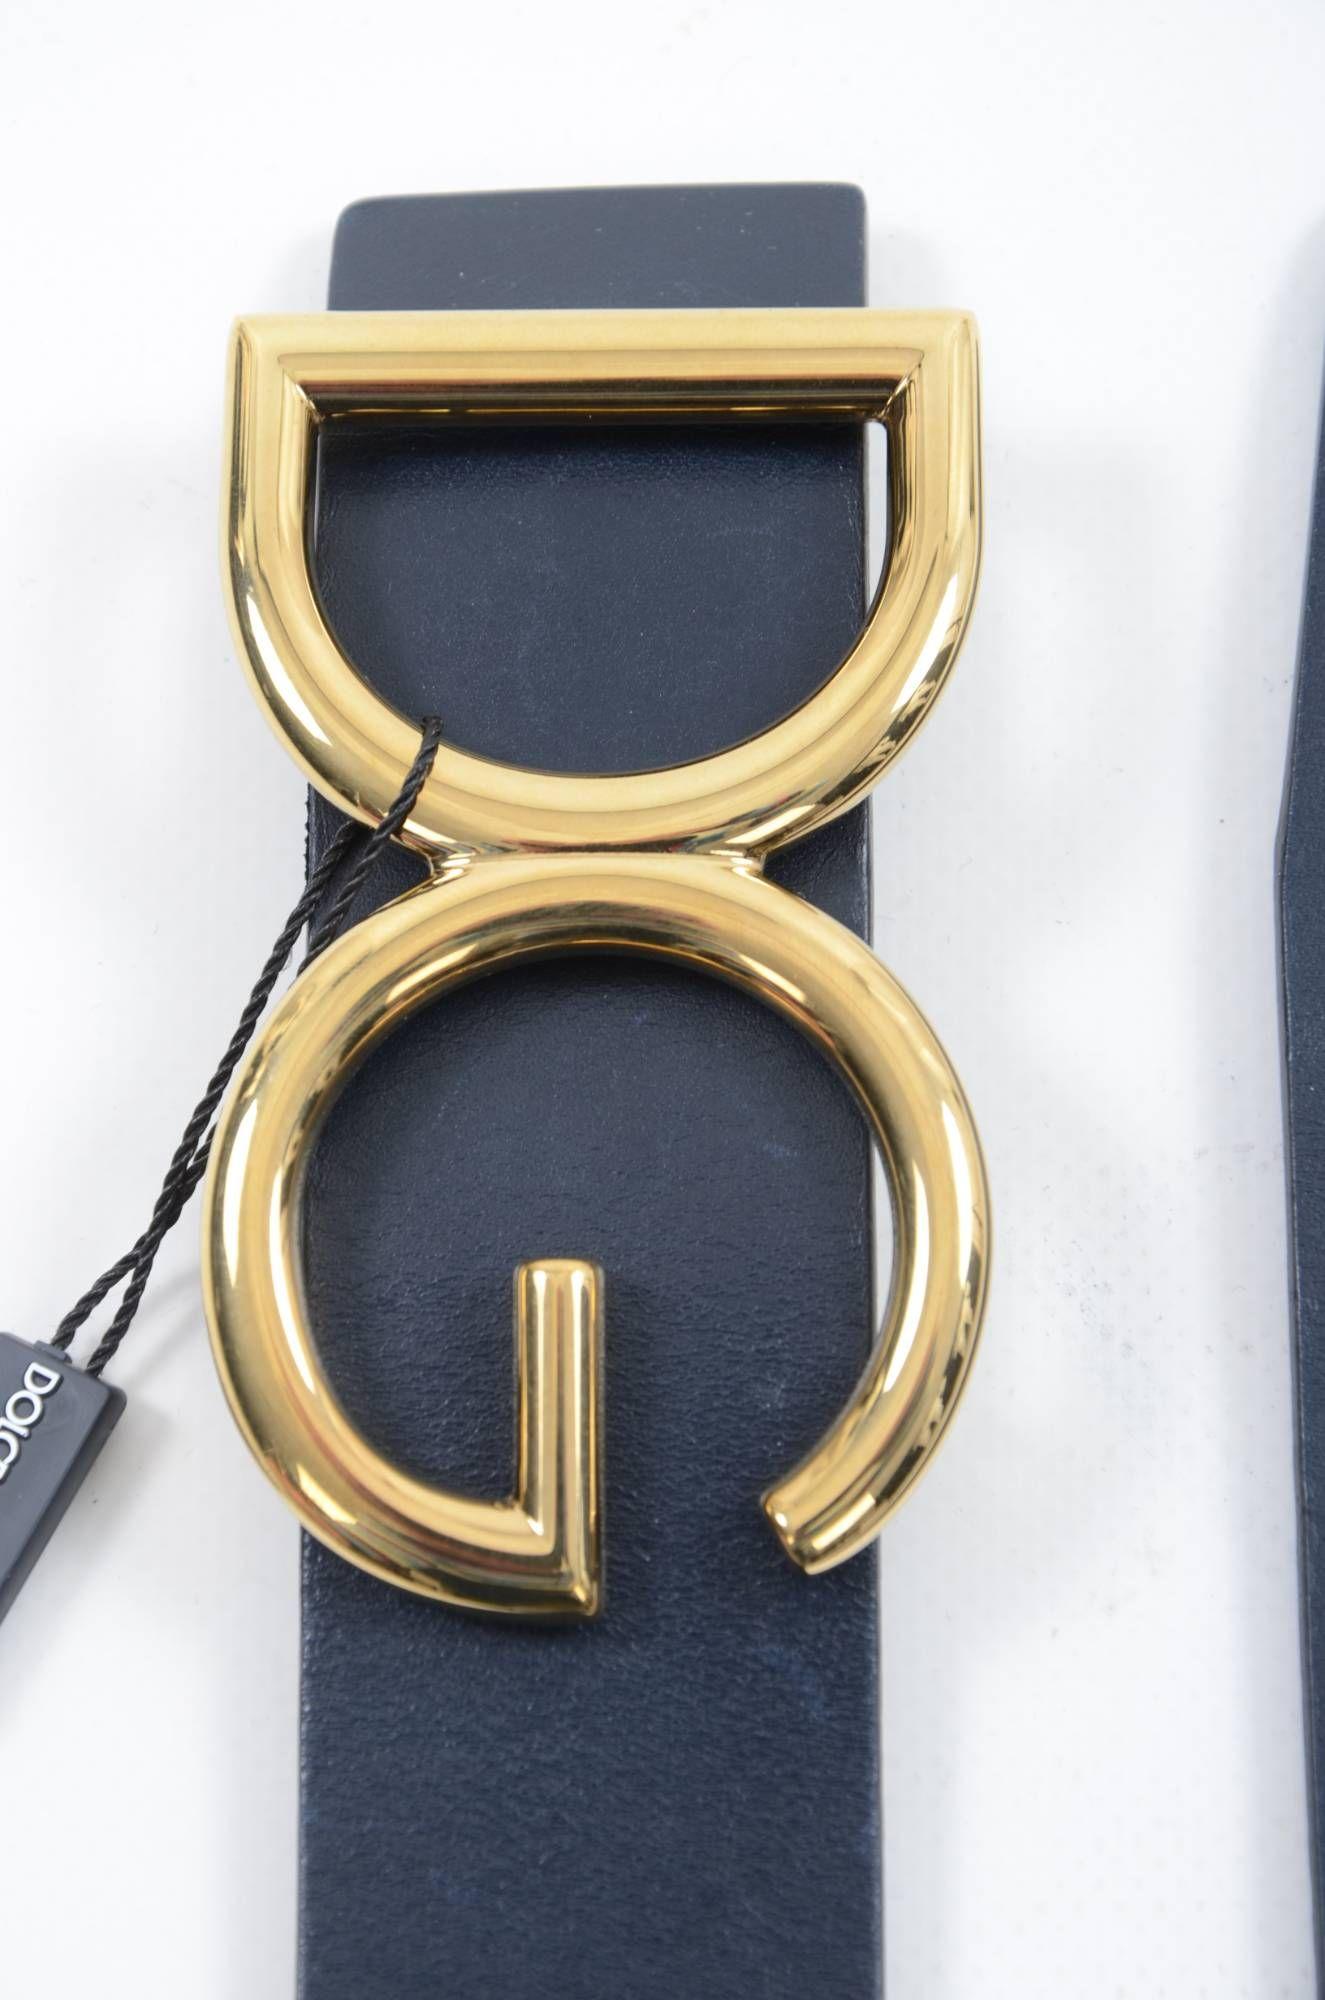 Dolce & Gabbana Men DG Leather Belt